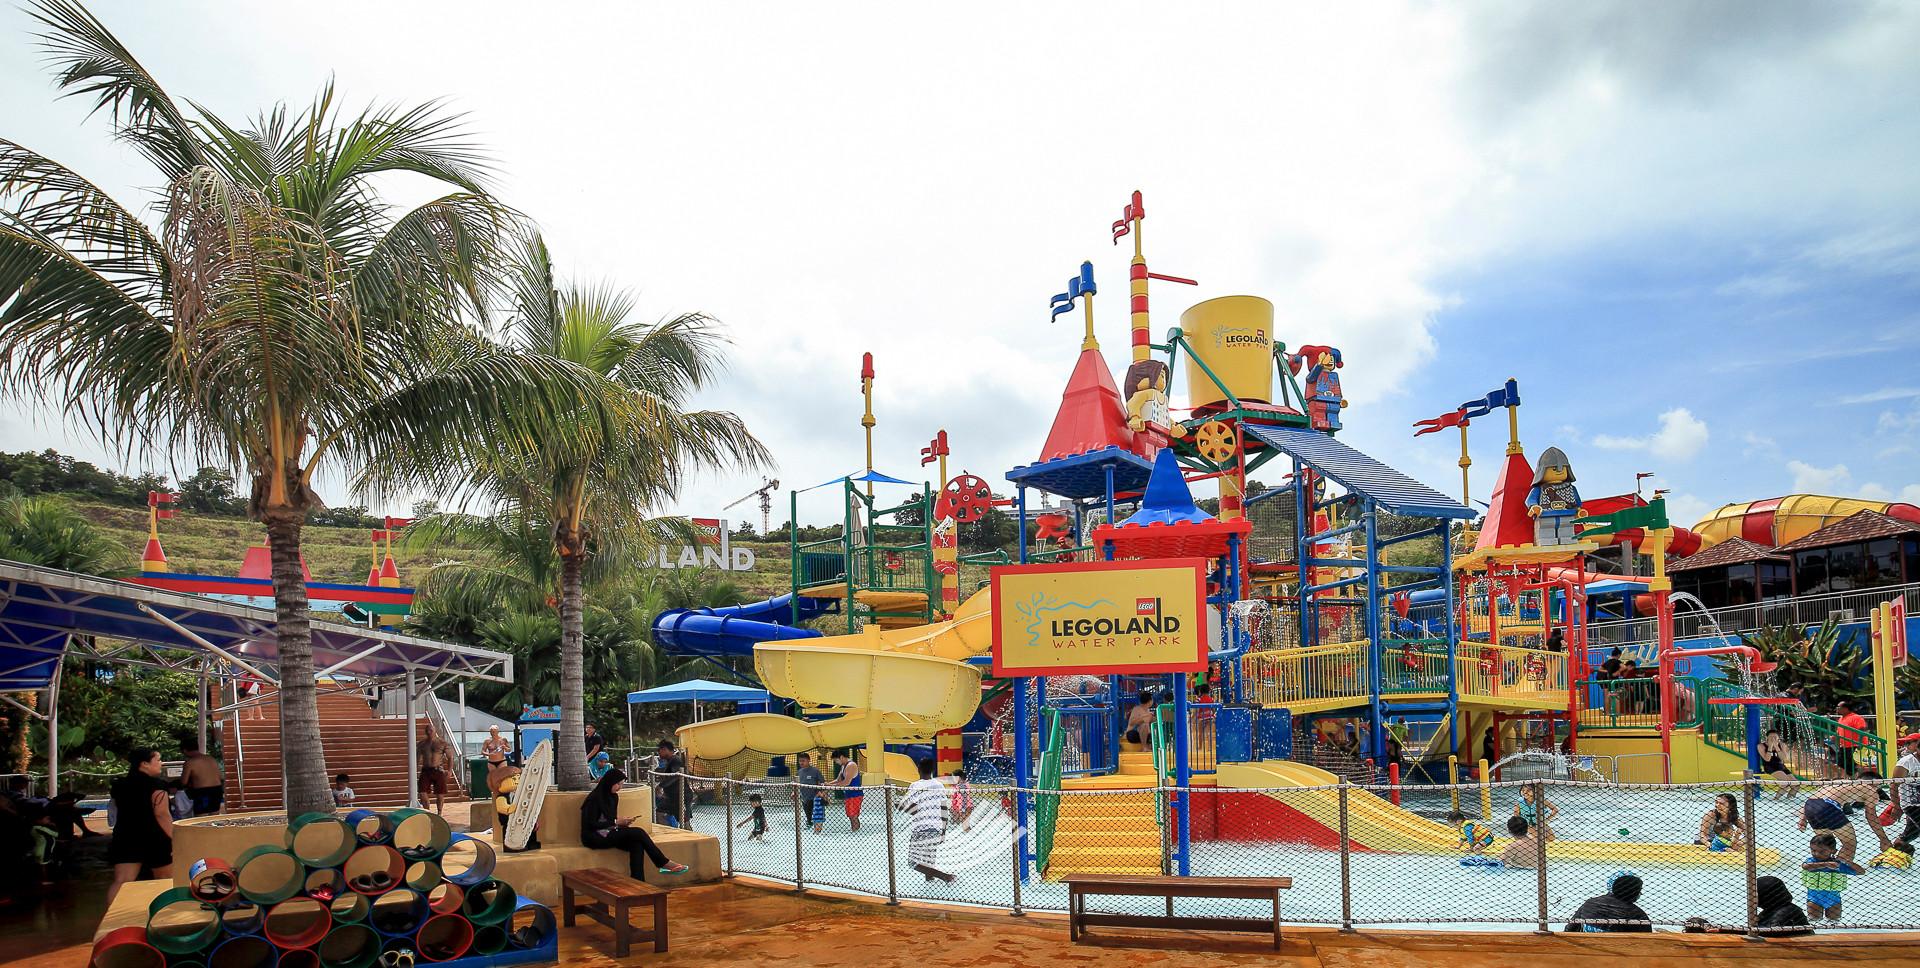 Legoland Johor_IMG_2839a v2.jpg